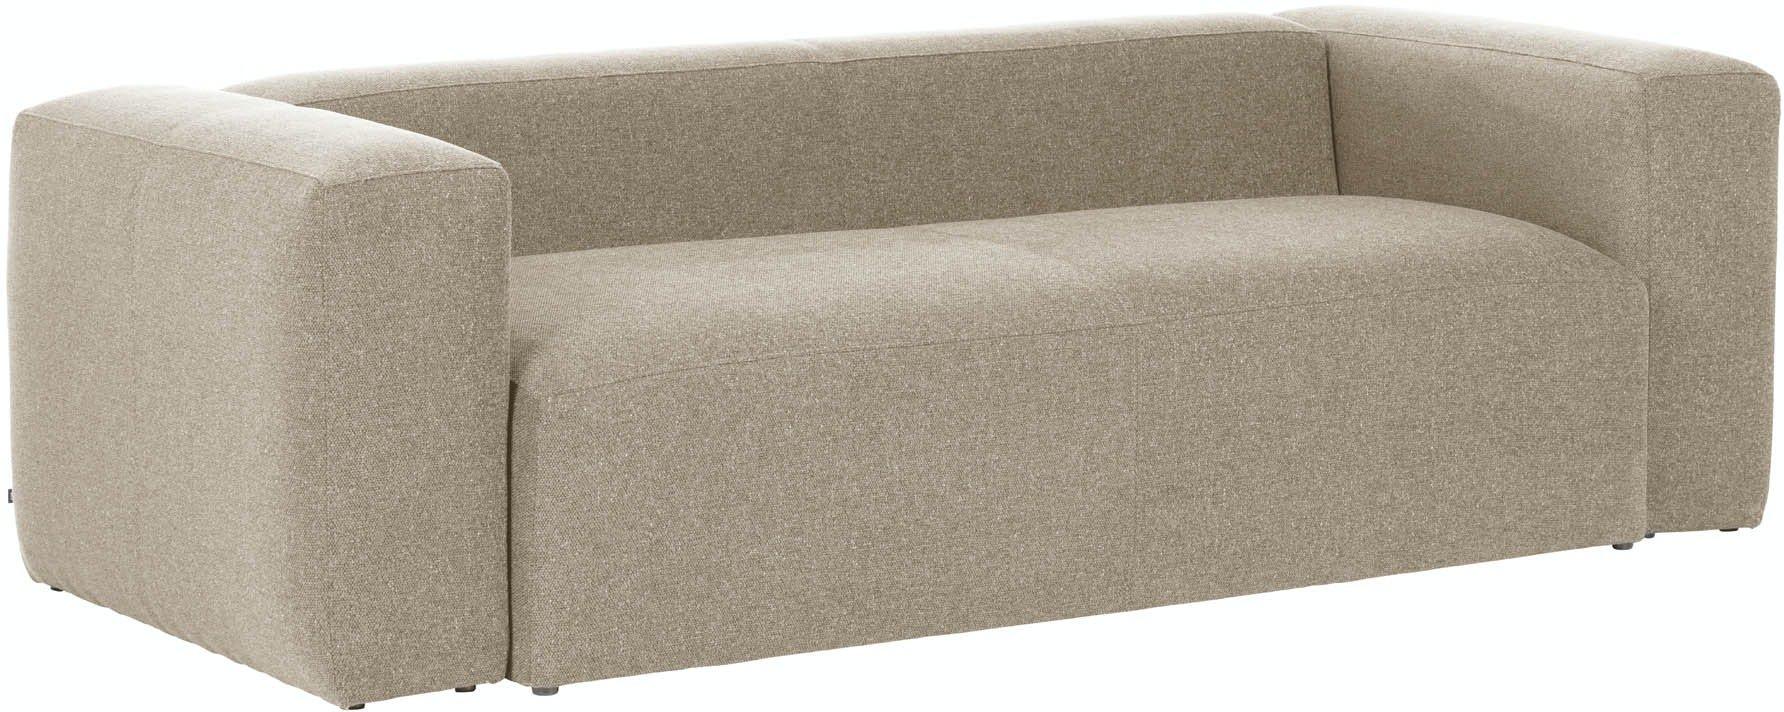 Blok, 3-personers sofa, Stof by LaForma (H: 69 cm. B: 240 cm. L: 100 cm., Beige)